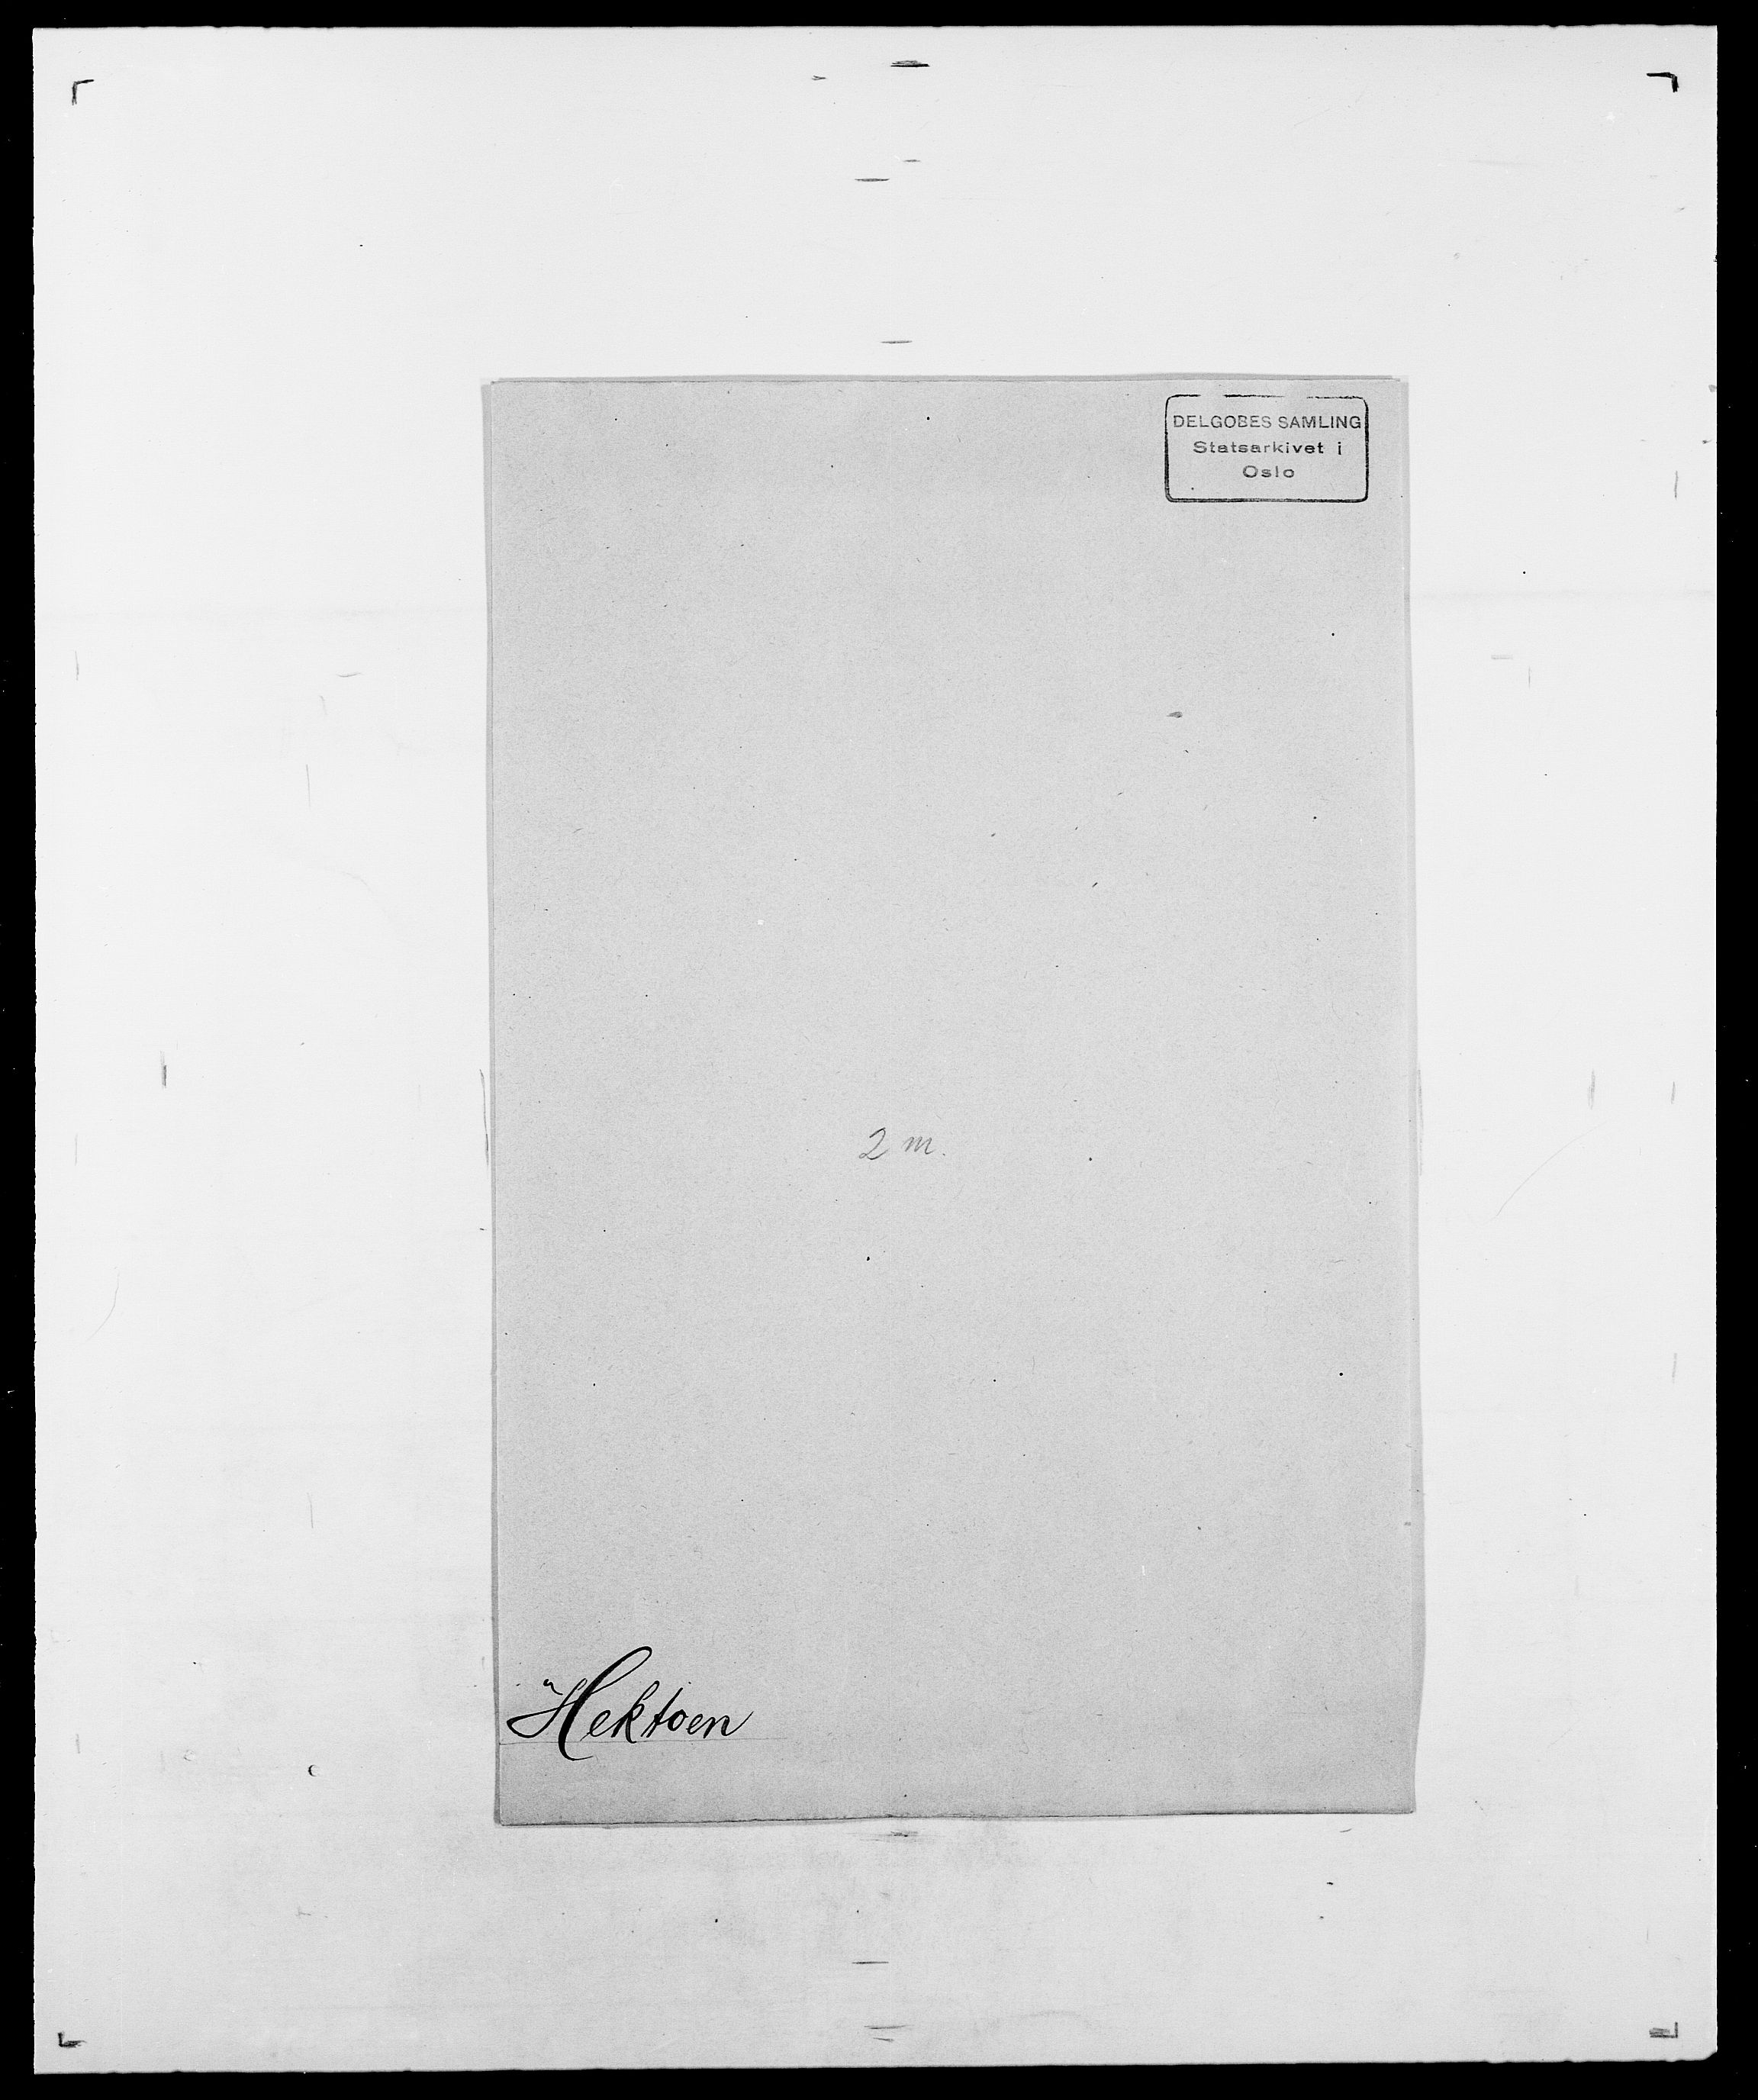 SAO, Delgobe, Charles Antoine - samling, D/Da/L0016: Hamborg - Hektoen, s. 882